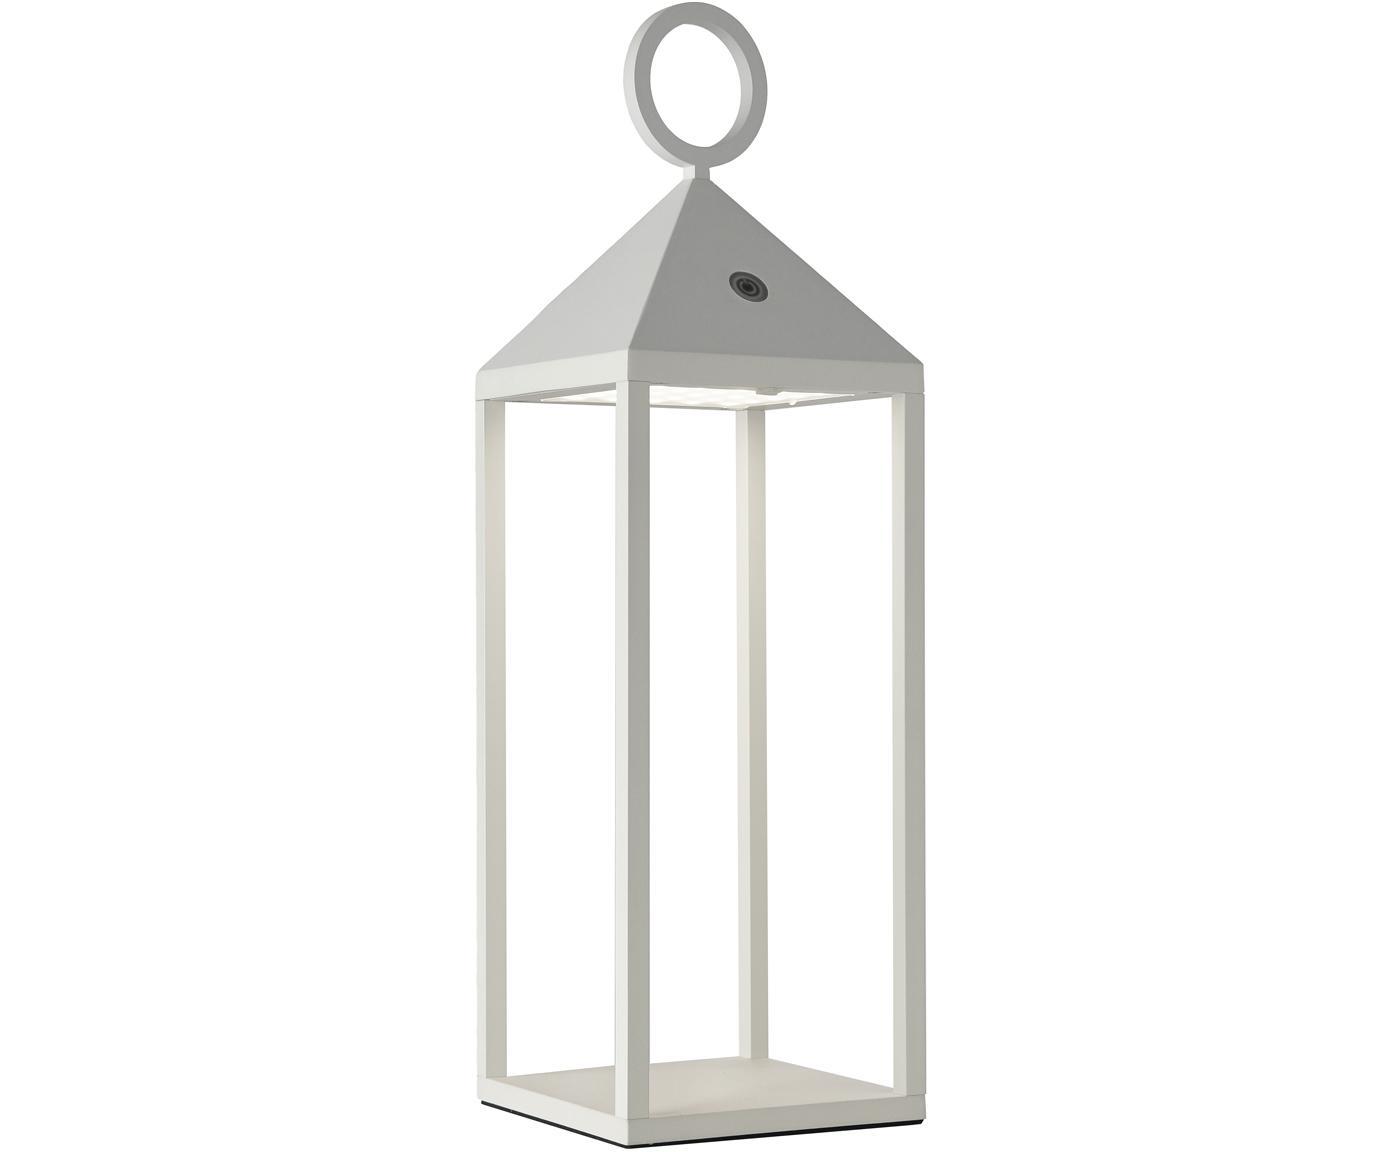 Mobiele outdoor LED lamp Cargo, Gelakt aluminium, Wit, 14 x 47 cm